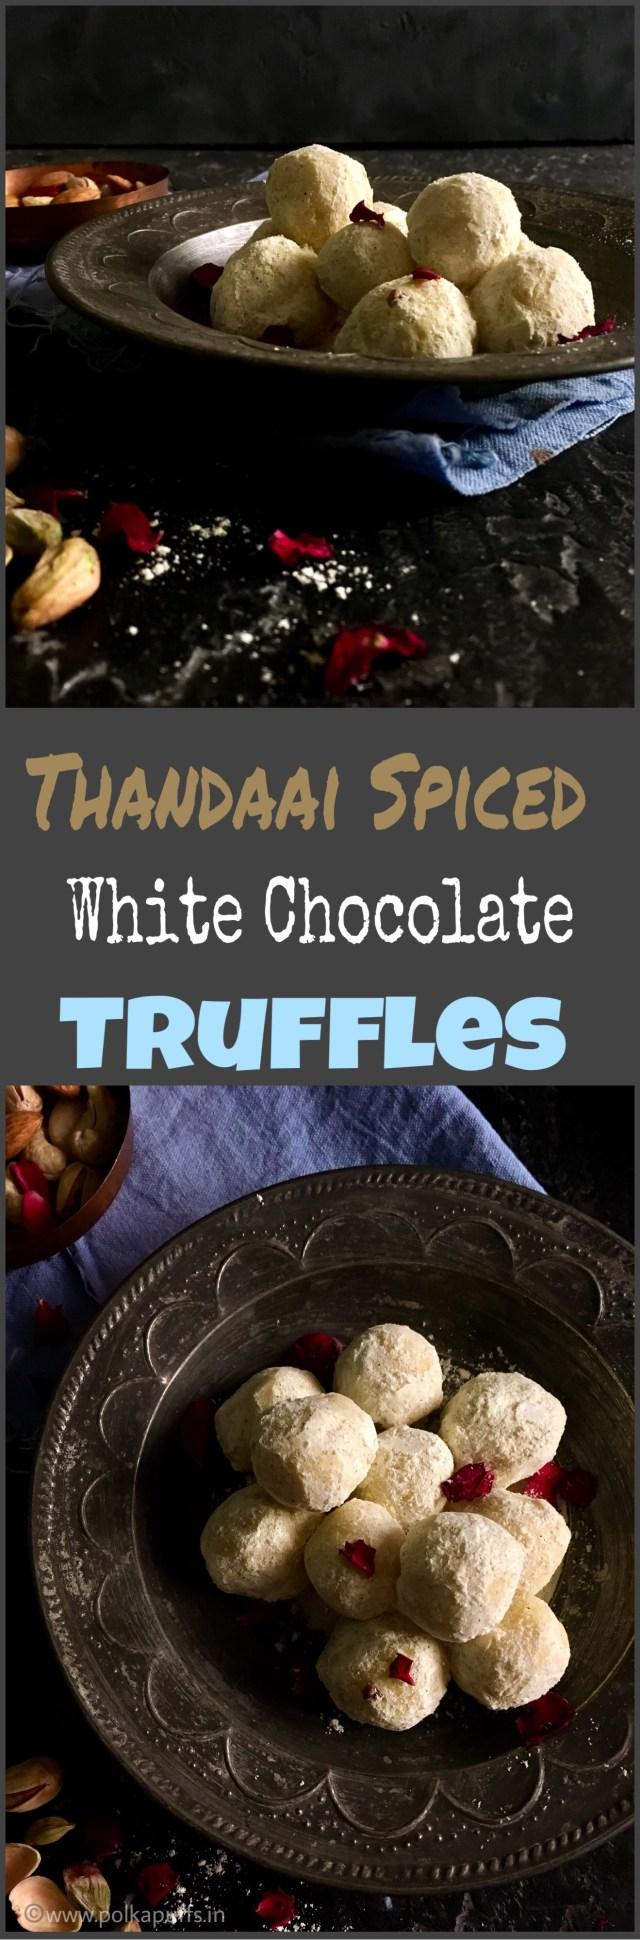 Thandaai Spiced White Chocolate Truffles